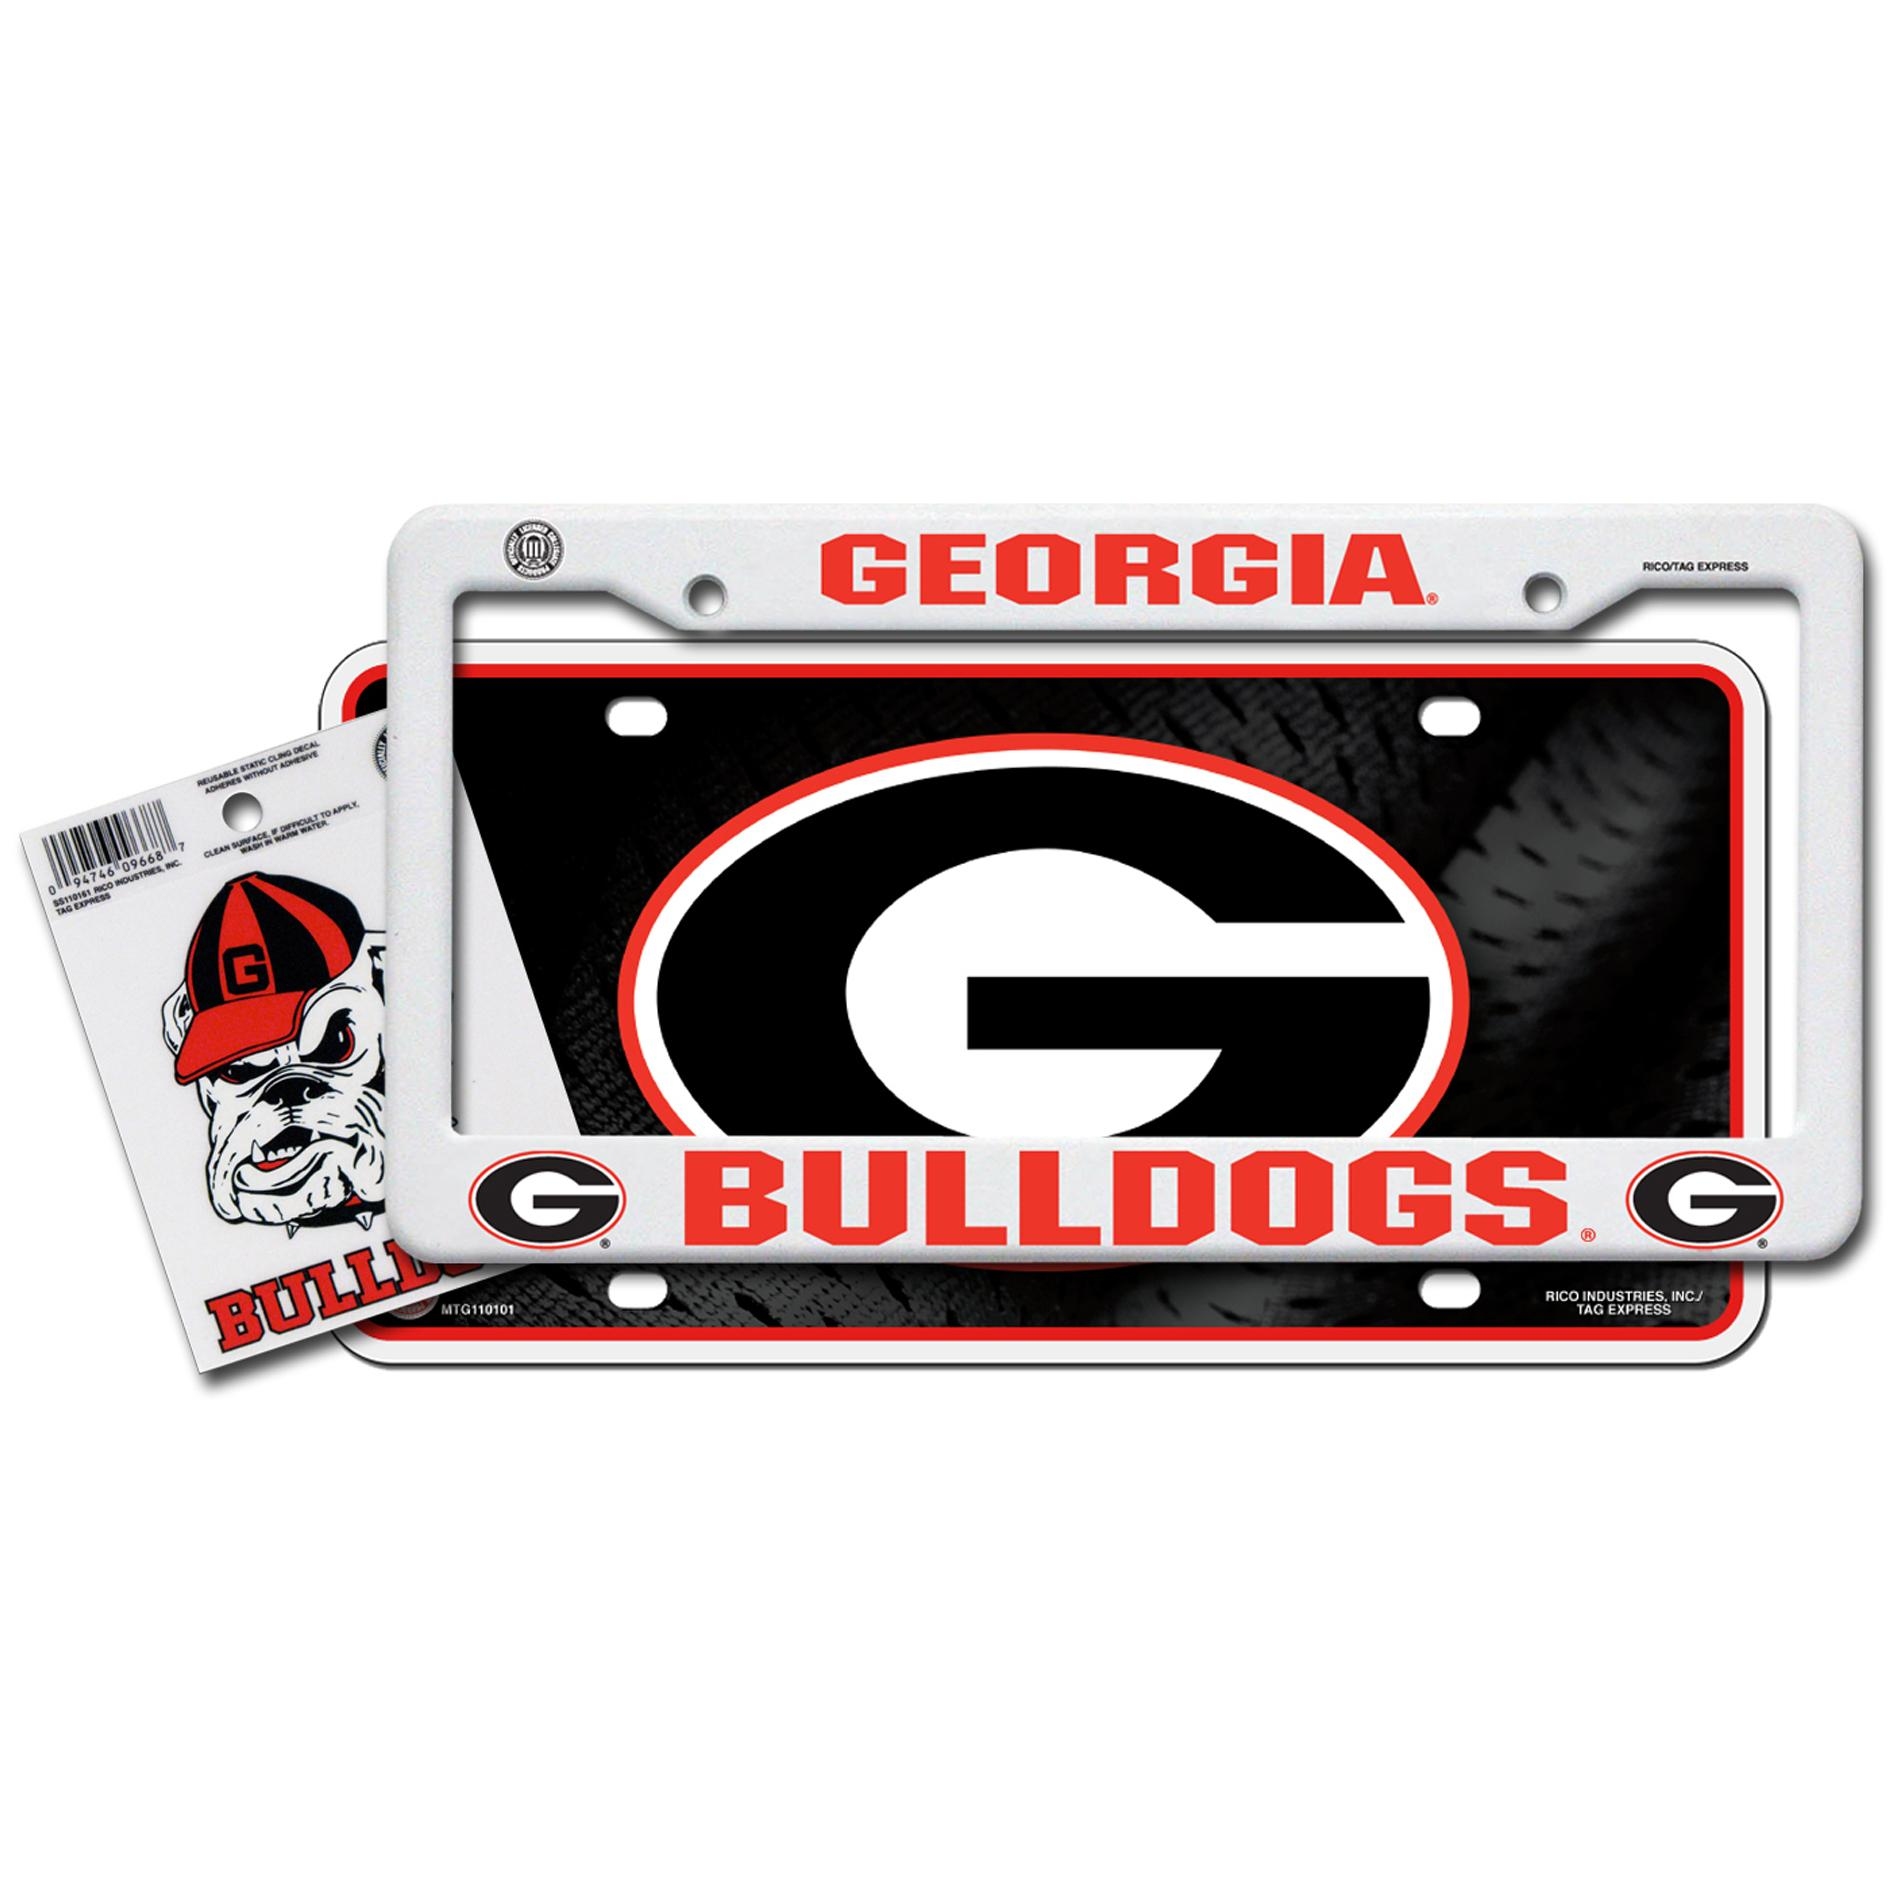 Georgia Bulldogs Automotive Value Pack